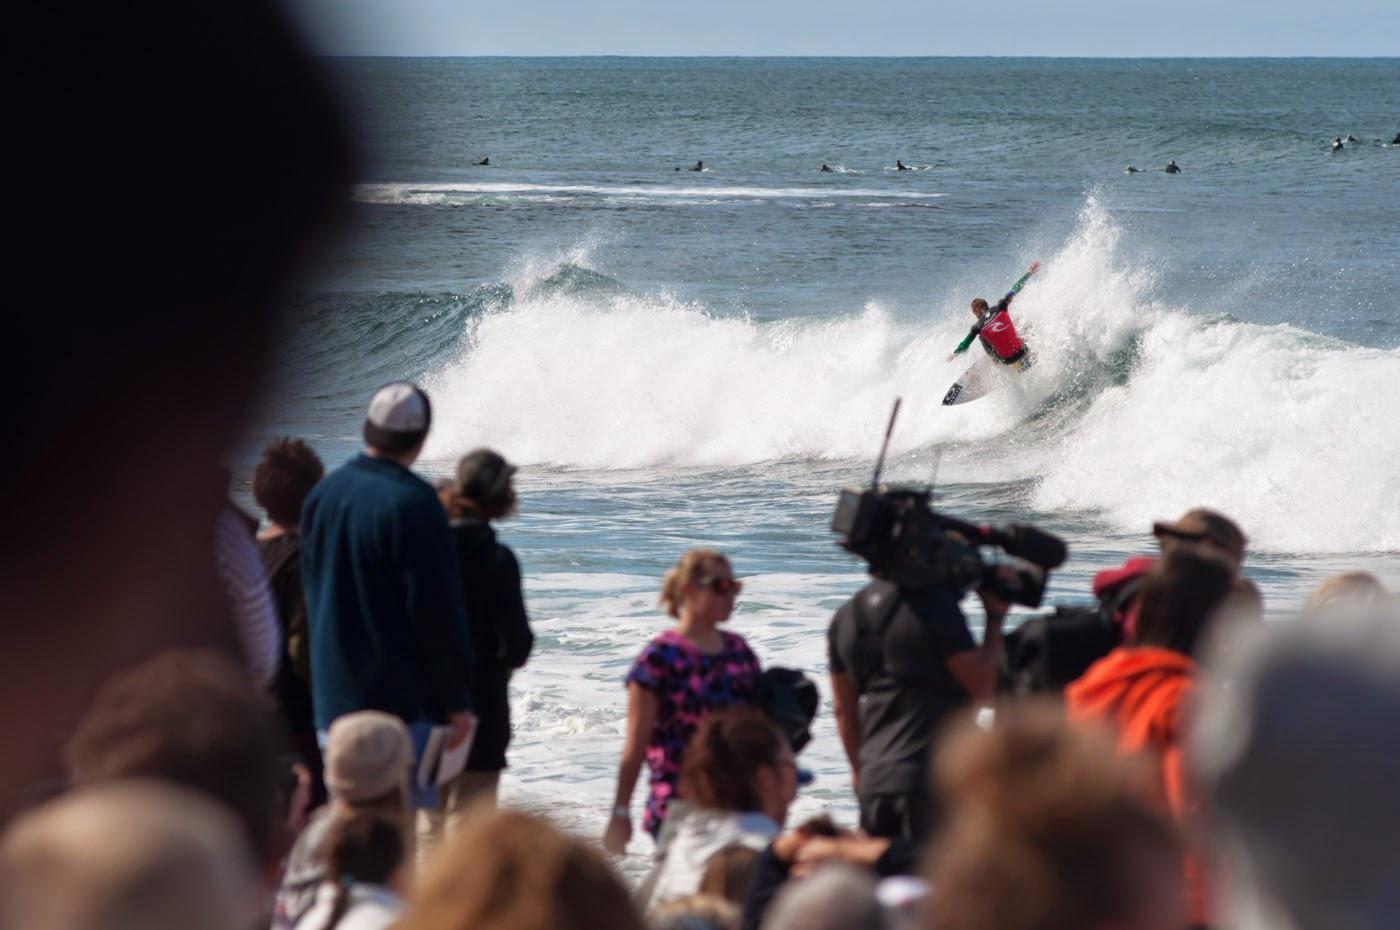 rip curl pro, rip curl, torquay, bells beach, bells, make it ring, 2014, tim macauley, surf, waves, australia, crowds, abstract, blocking, shredding, dissolve series, dissolve